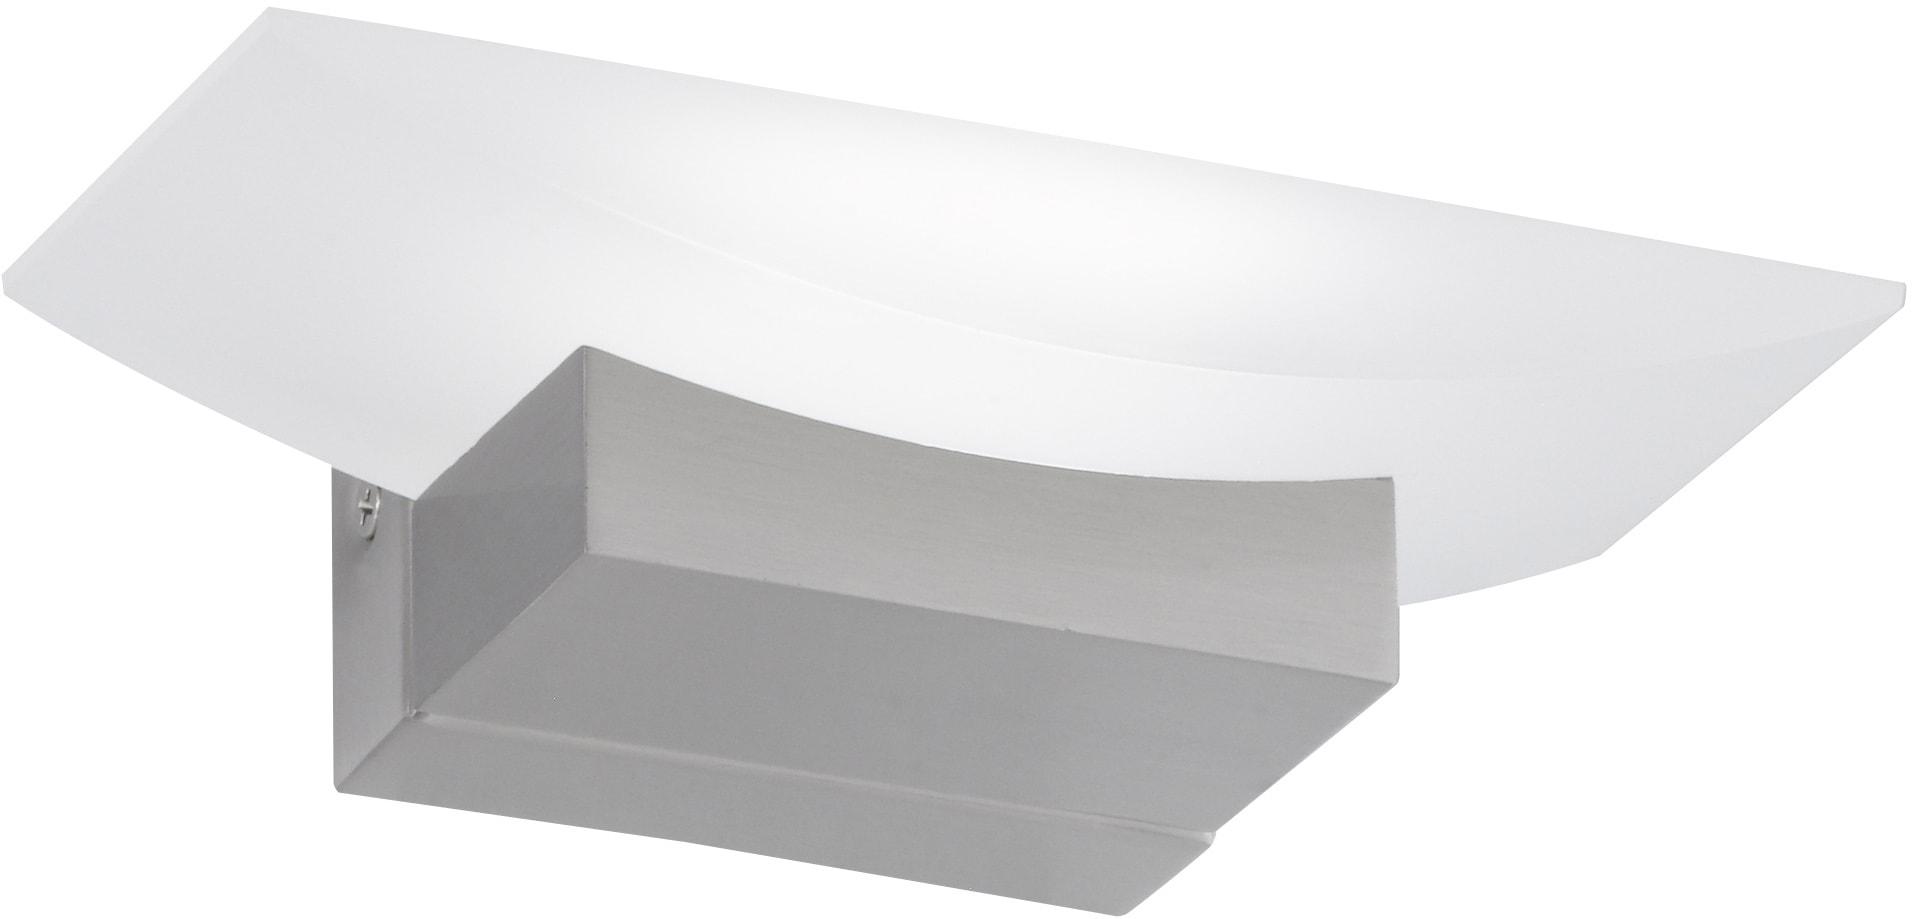 FISCHER & HONSEL LED Wandleuchte Bowl TW, LED-Modul, Warmweiß-Neutralweiß